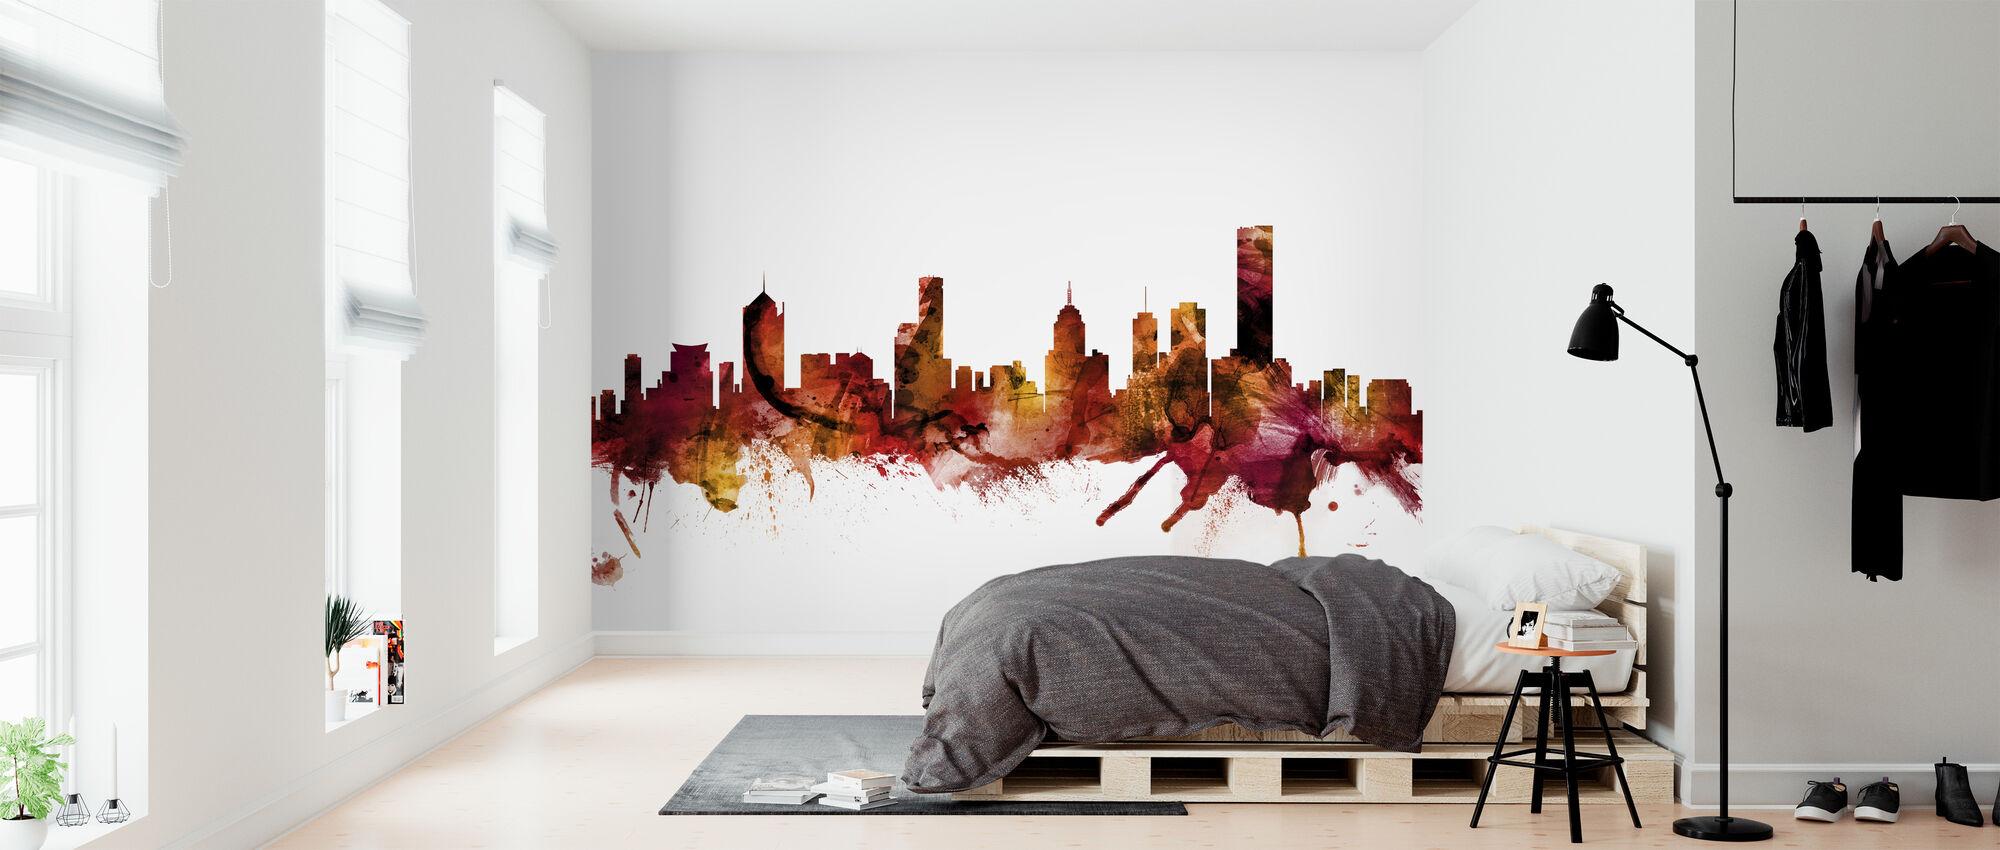 Melbourne Australia Skyline - Wallpaper - Bedroom